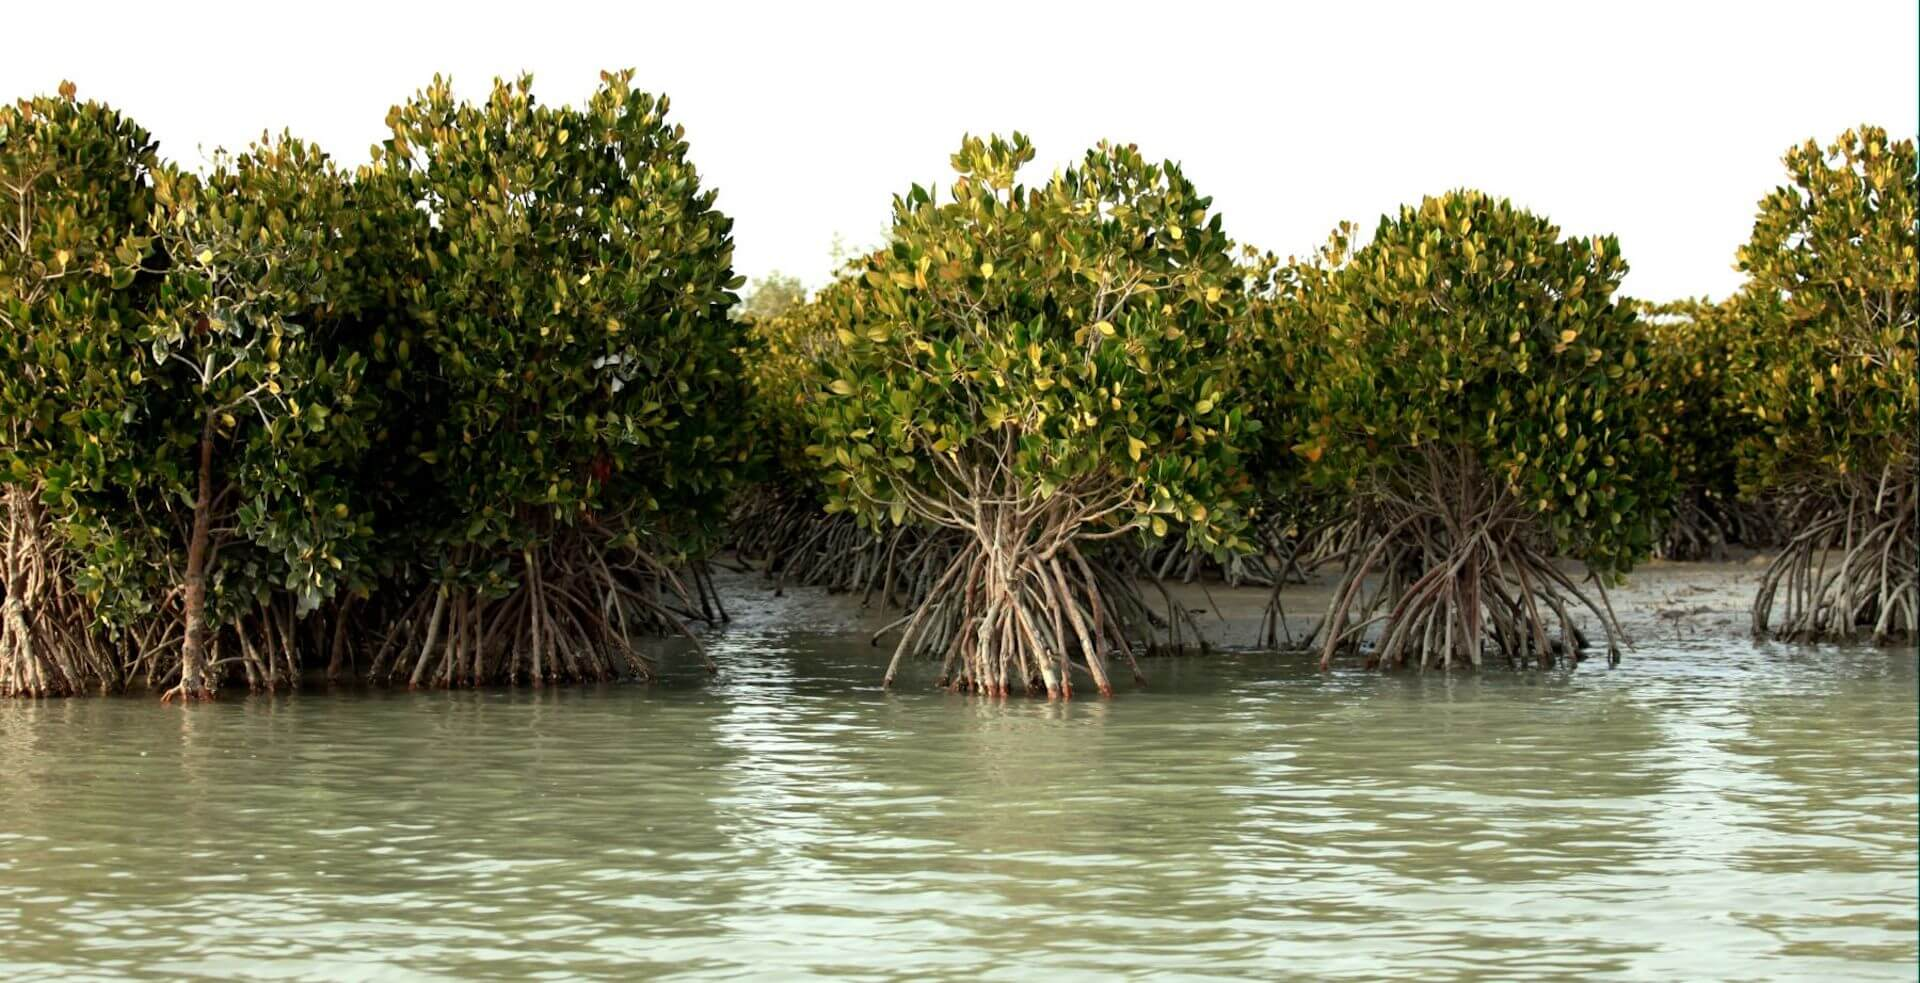 Het Hara mangrovebos op het eiland Qeshm in Iran